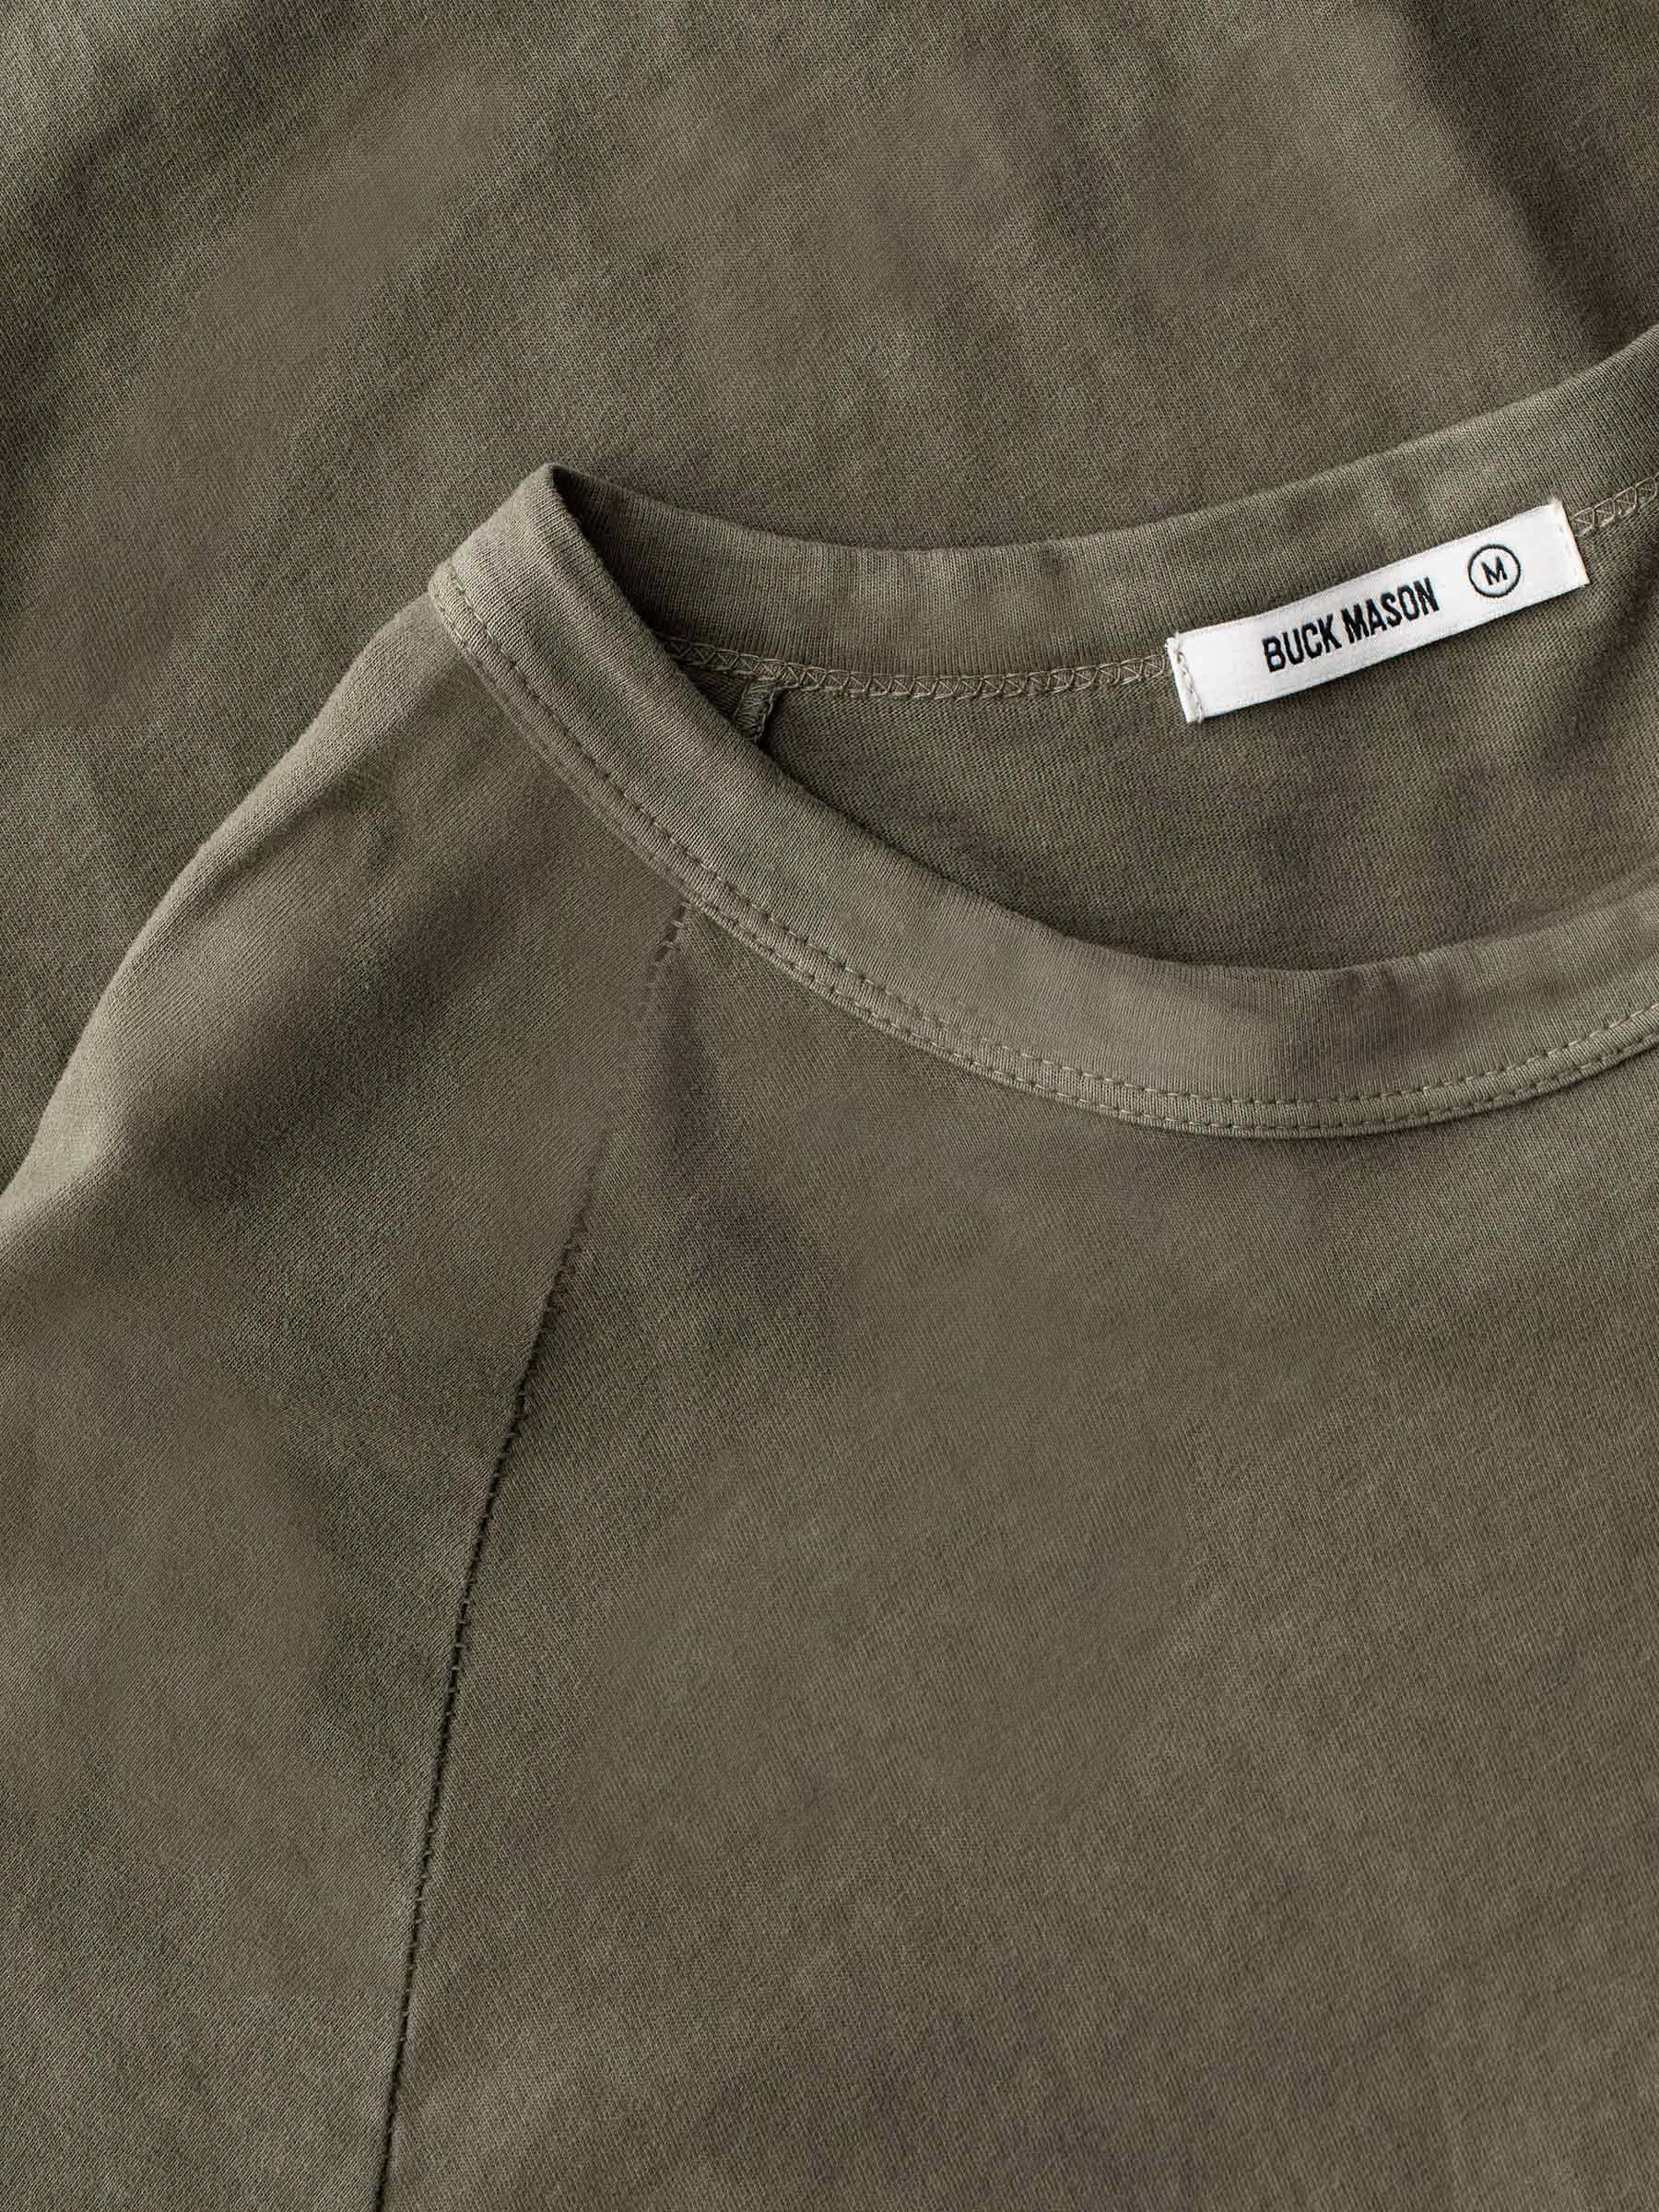 Buck Mason - Natural Venice Wash Sueded Cotton Long Sleeve Raglan Tee